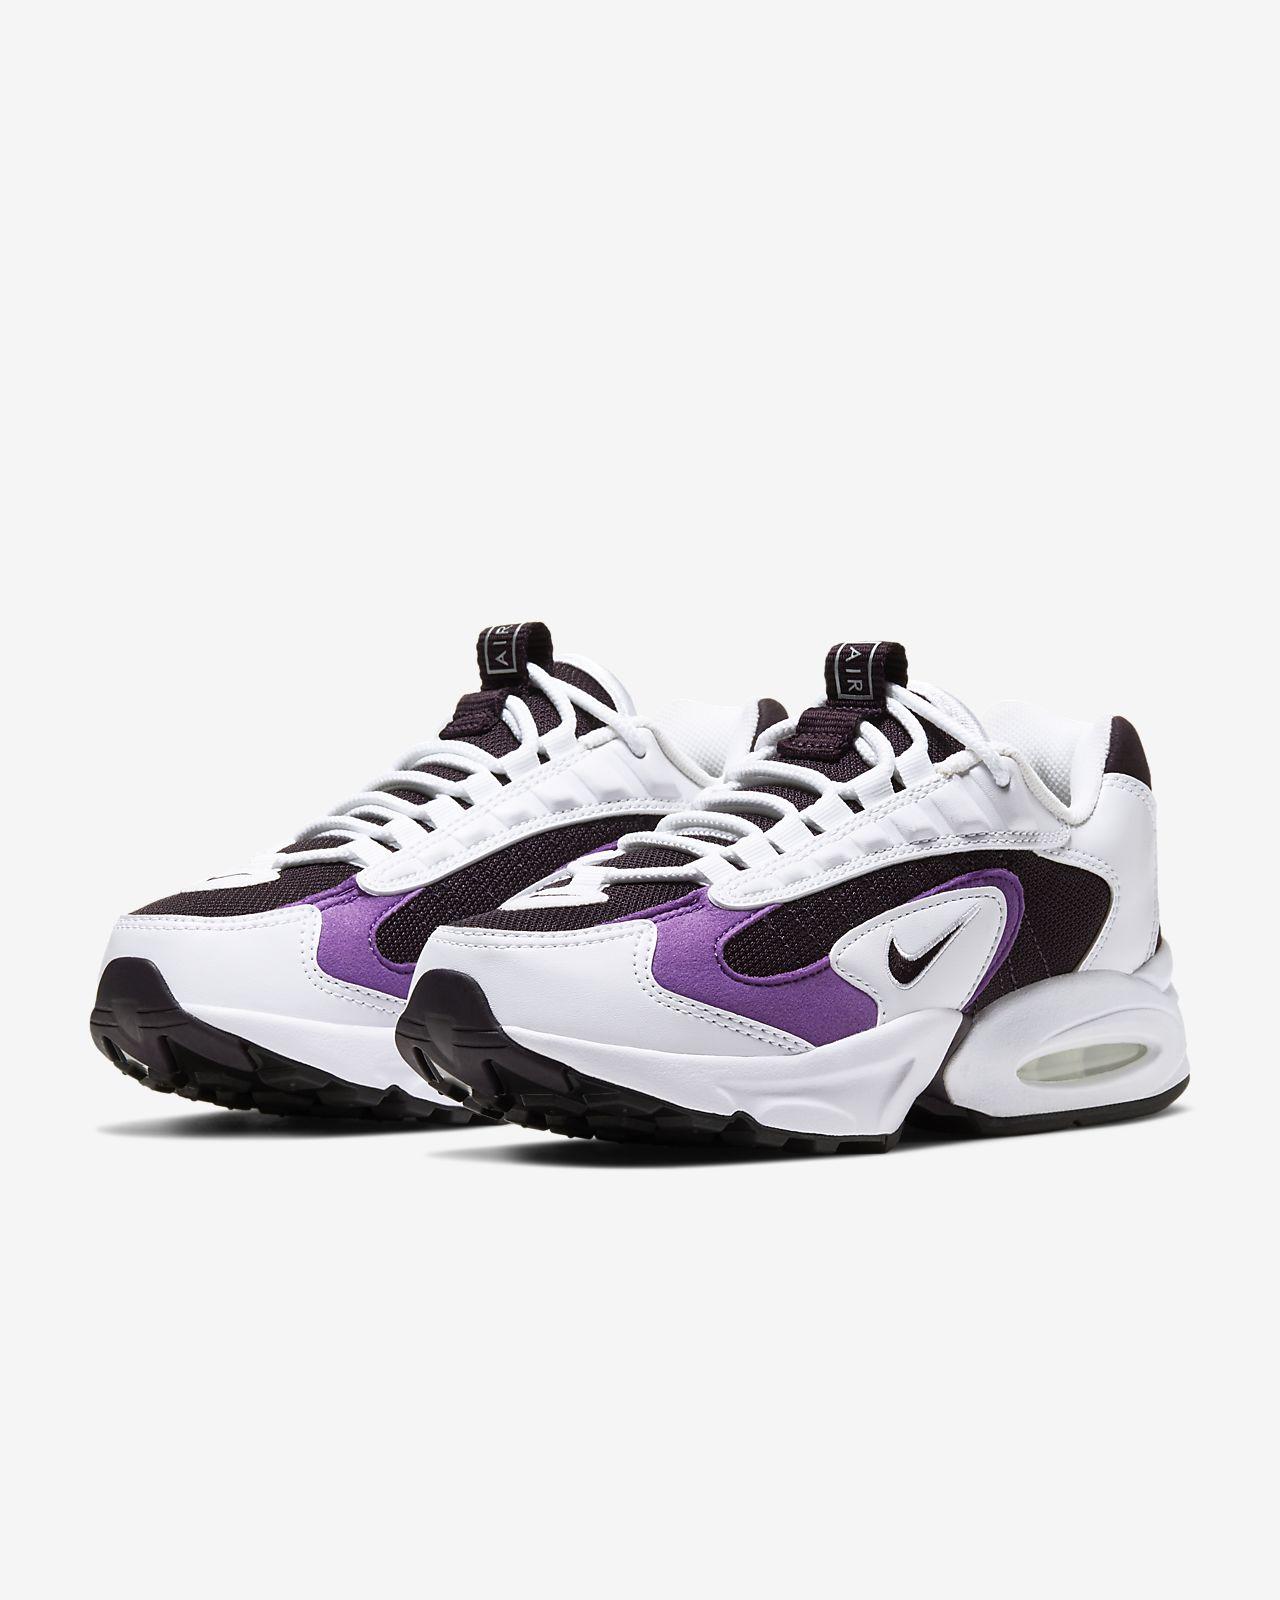 Mulheres Nike Sapatilhas Portugal